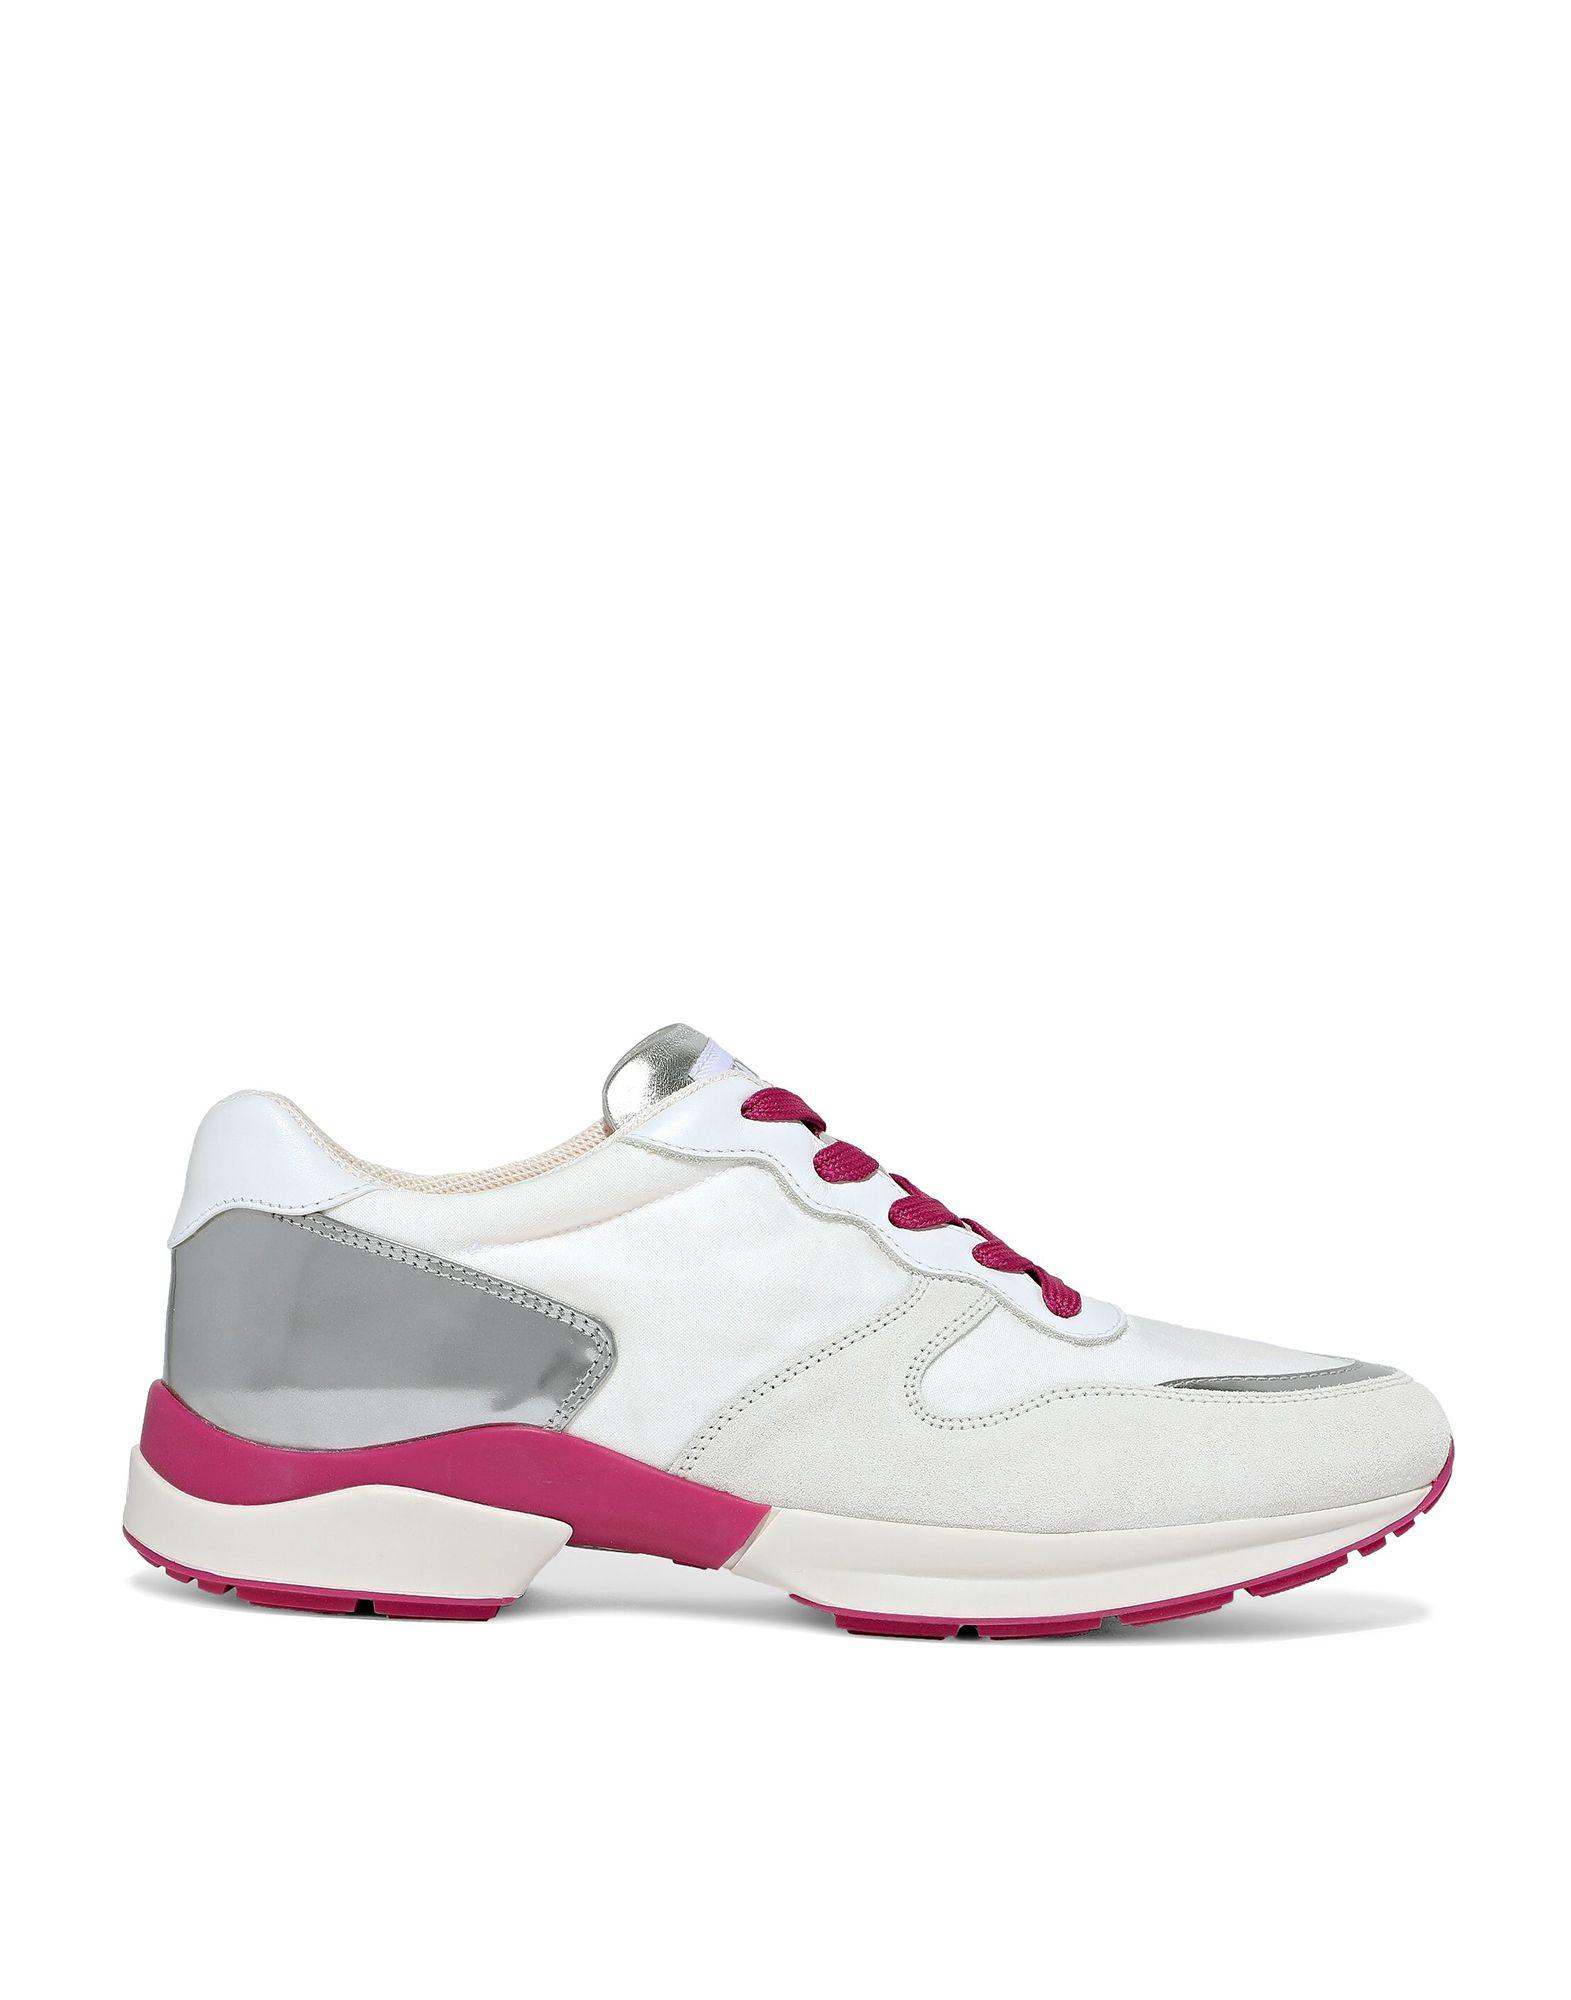 0e22ef923d0 TOD'S ΠΑΠΟΥΤΣΙΑ Παπούτσια τένις χαμηλά, Γυναικεία παπούτσια τέννις ...